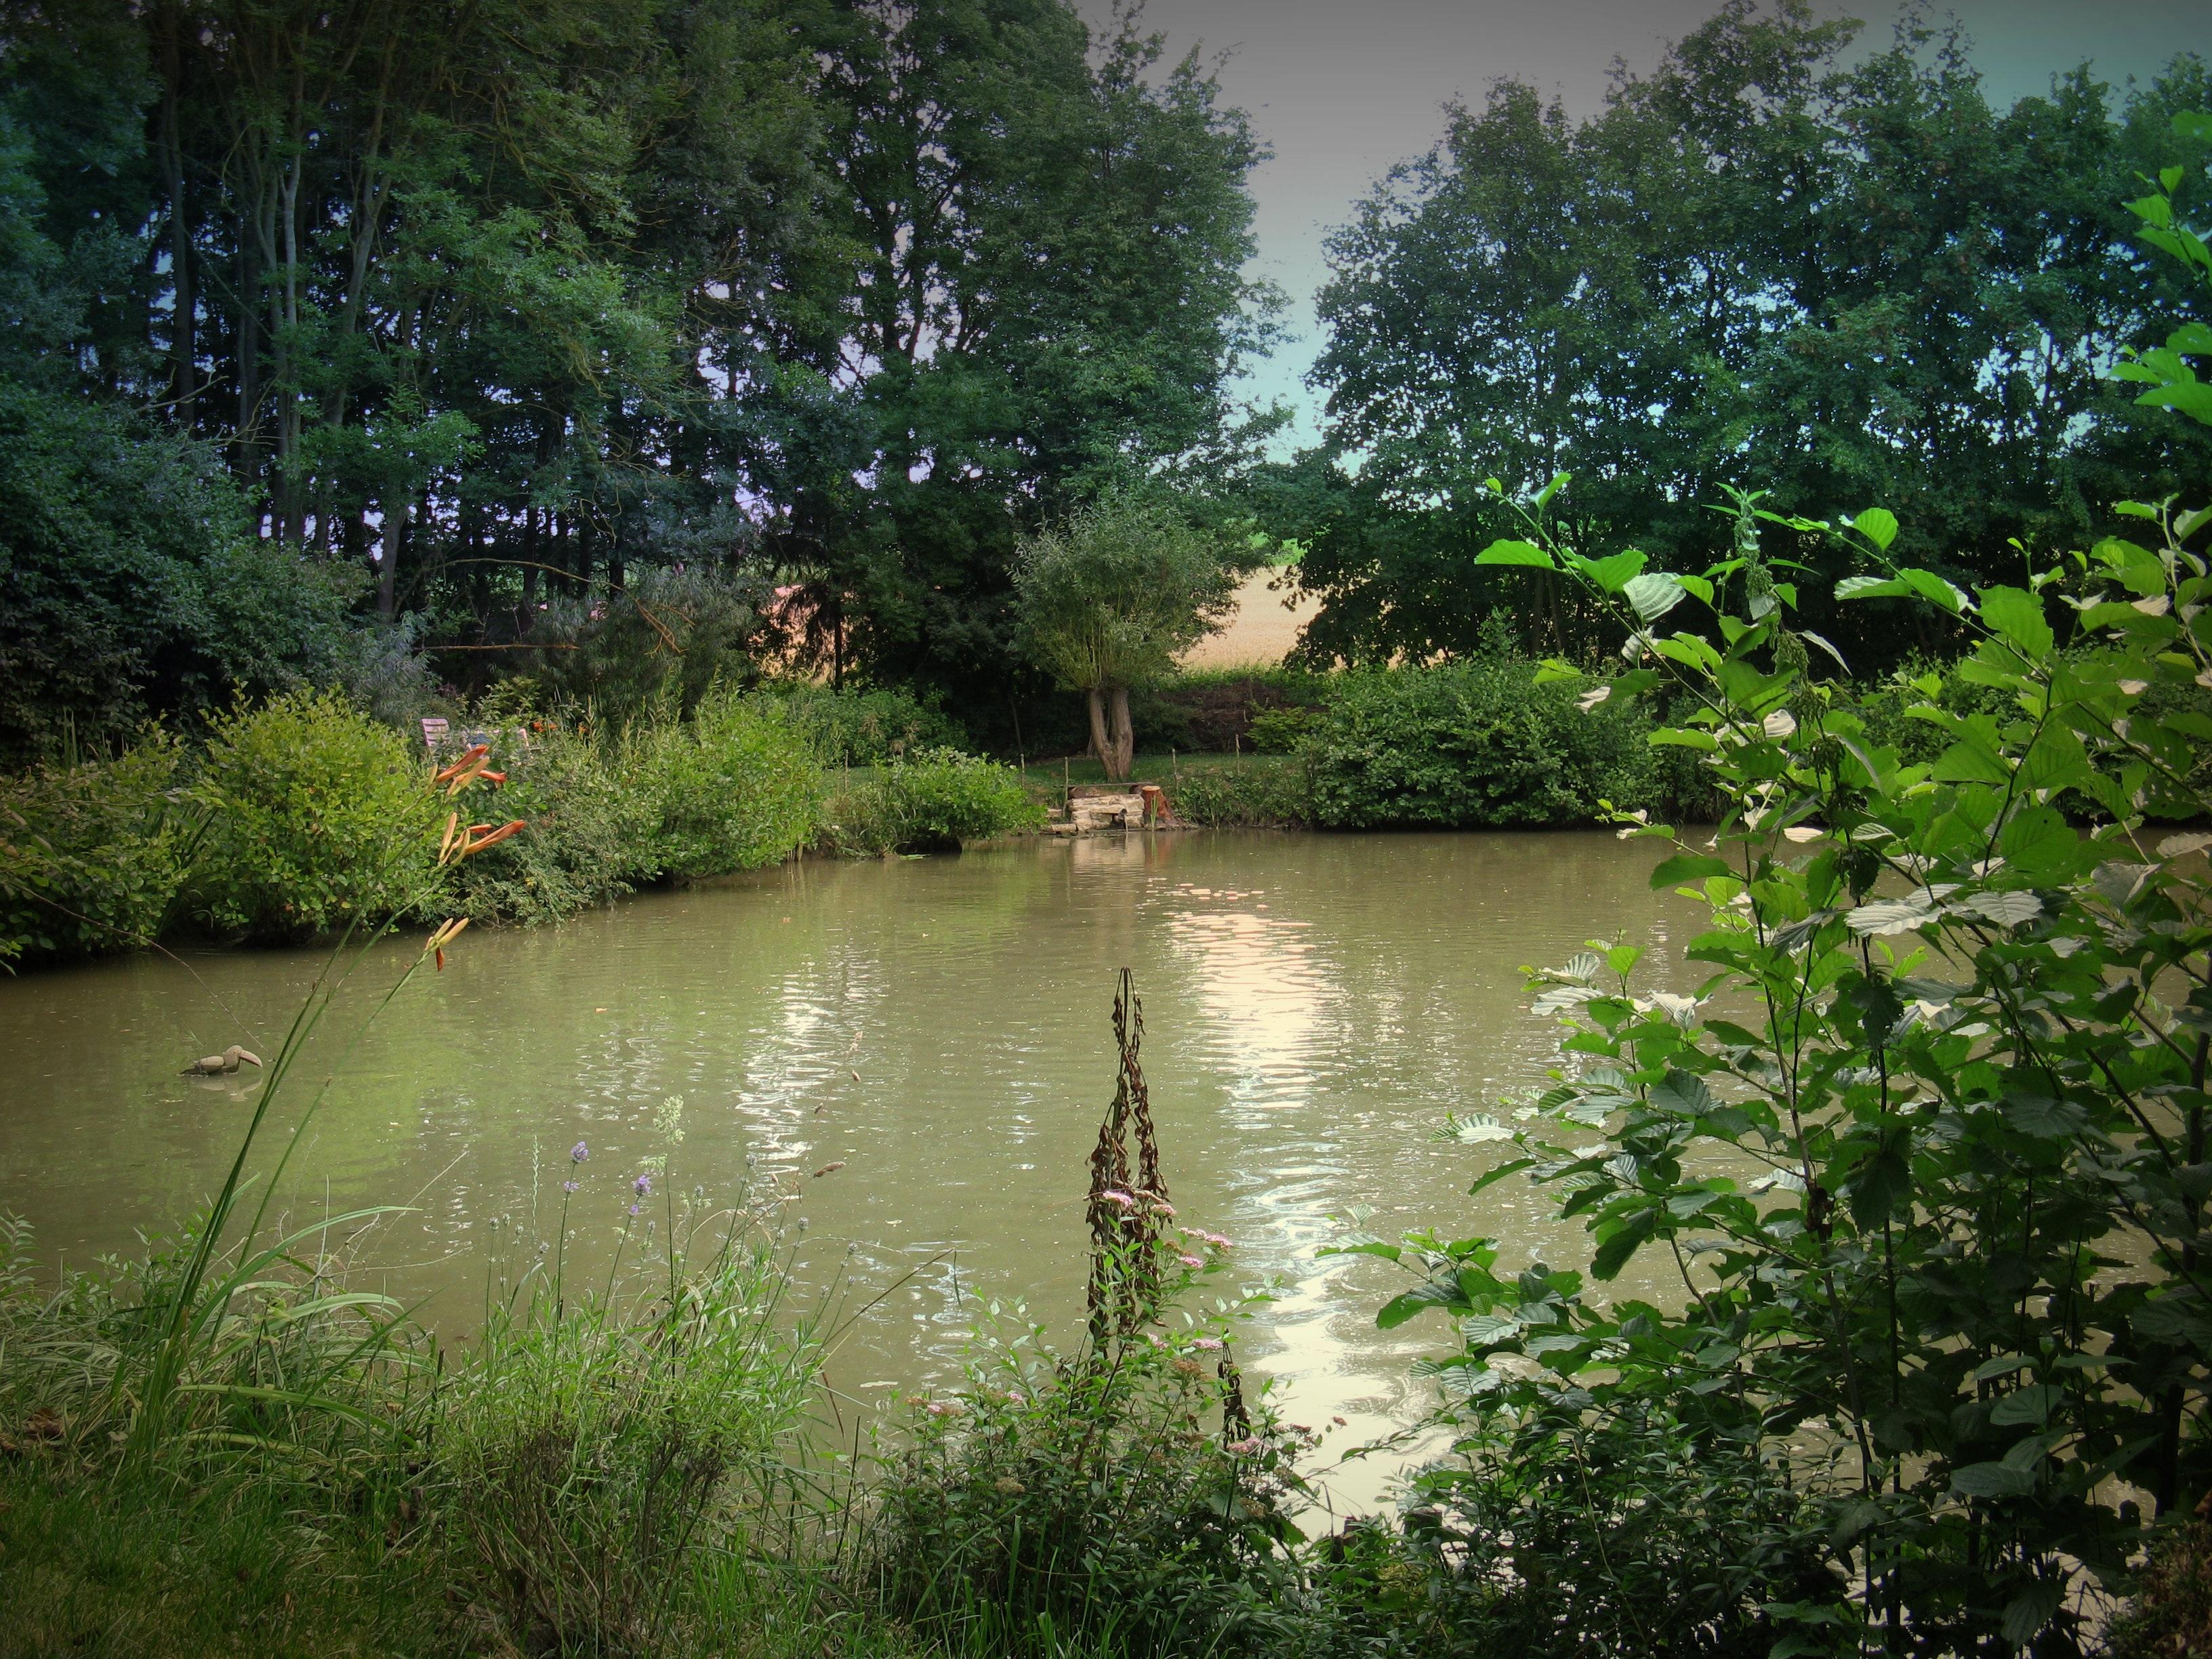 fotos gratis paisaje rbol naturaleza bosque lago. Black Bedroom Furniture Sets. Home Design Ideas